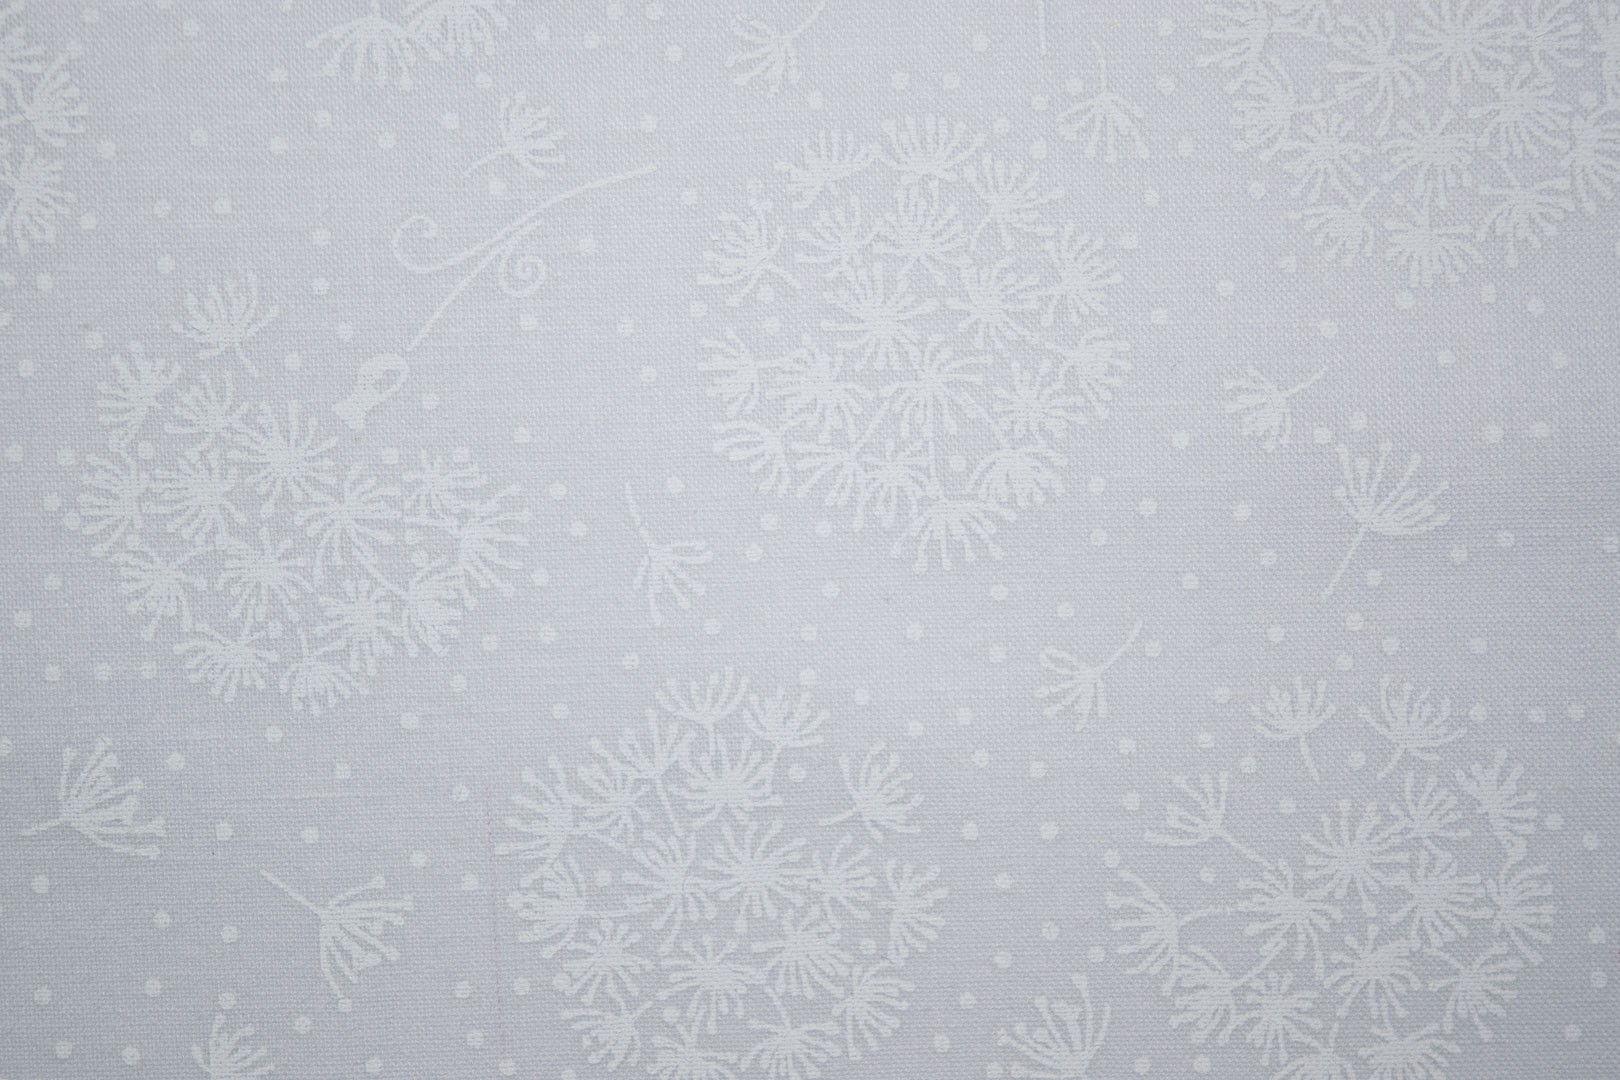 "149_47736_ww   45"" 68/68, 100% Carded Cotton"